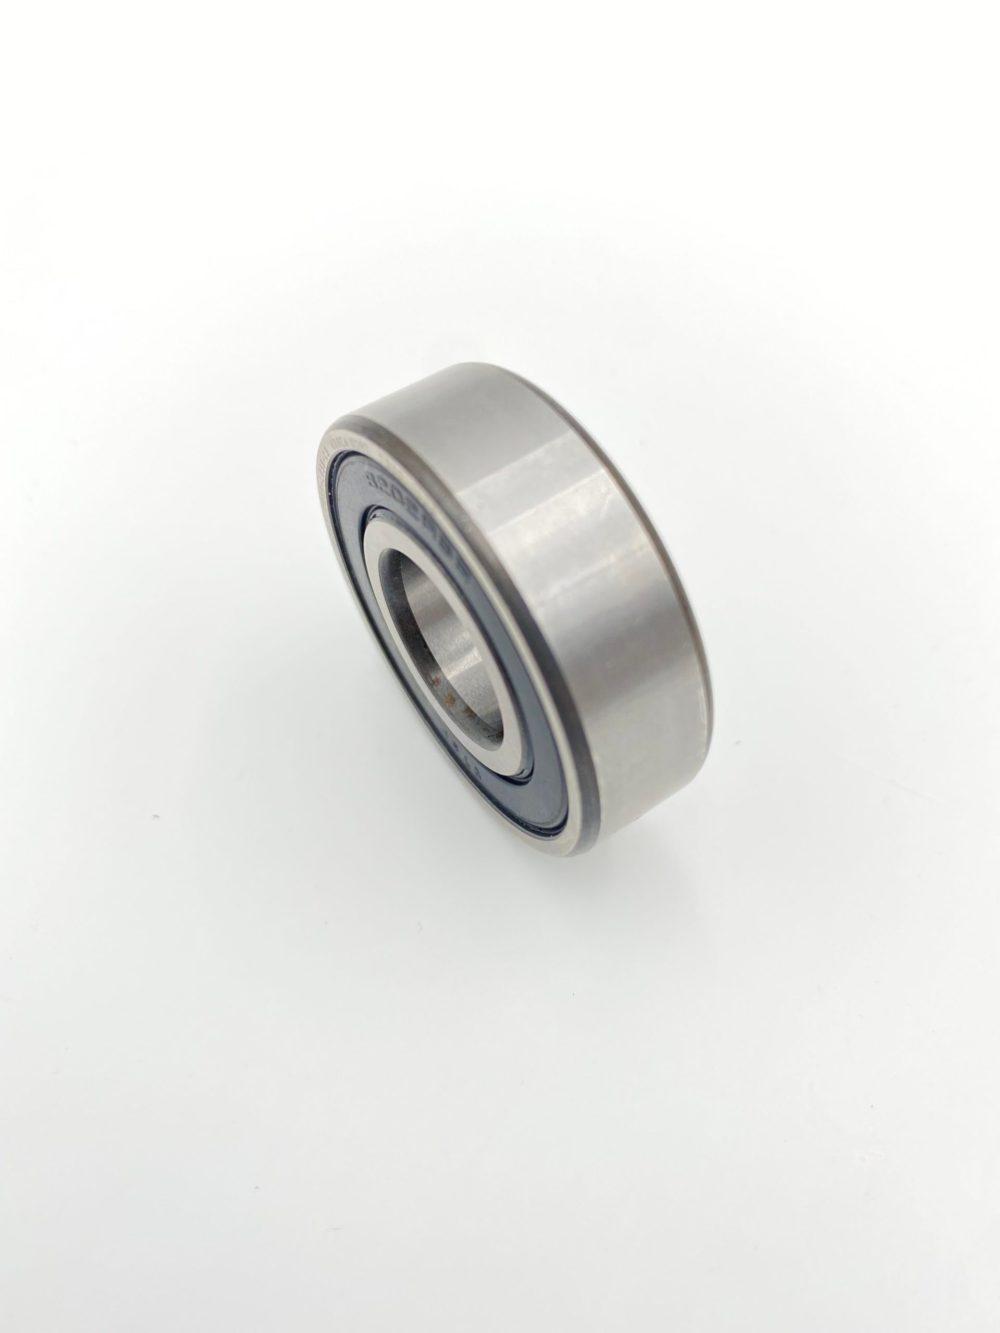 "Blade Guide Bearing for RMT Bandsaws 6202RSR, for 0.6"" (15mm) Shaft Diameter - RMTPM0070"